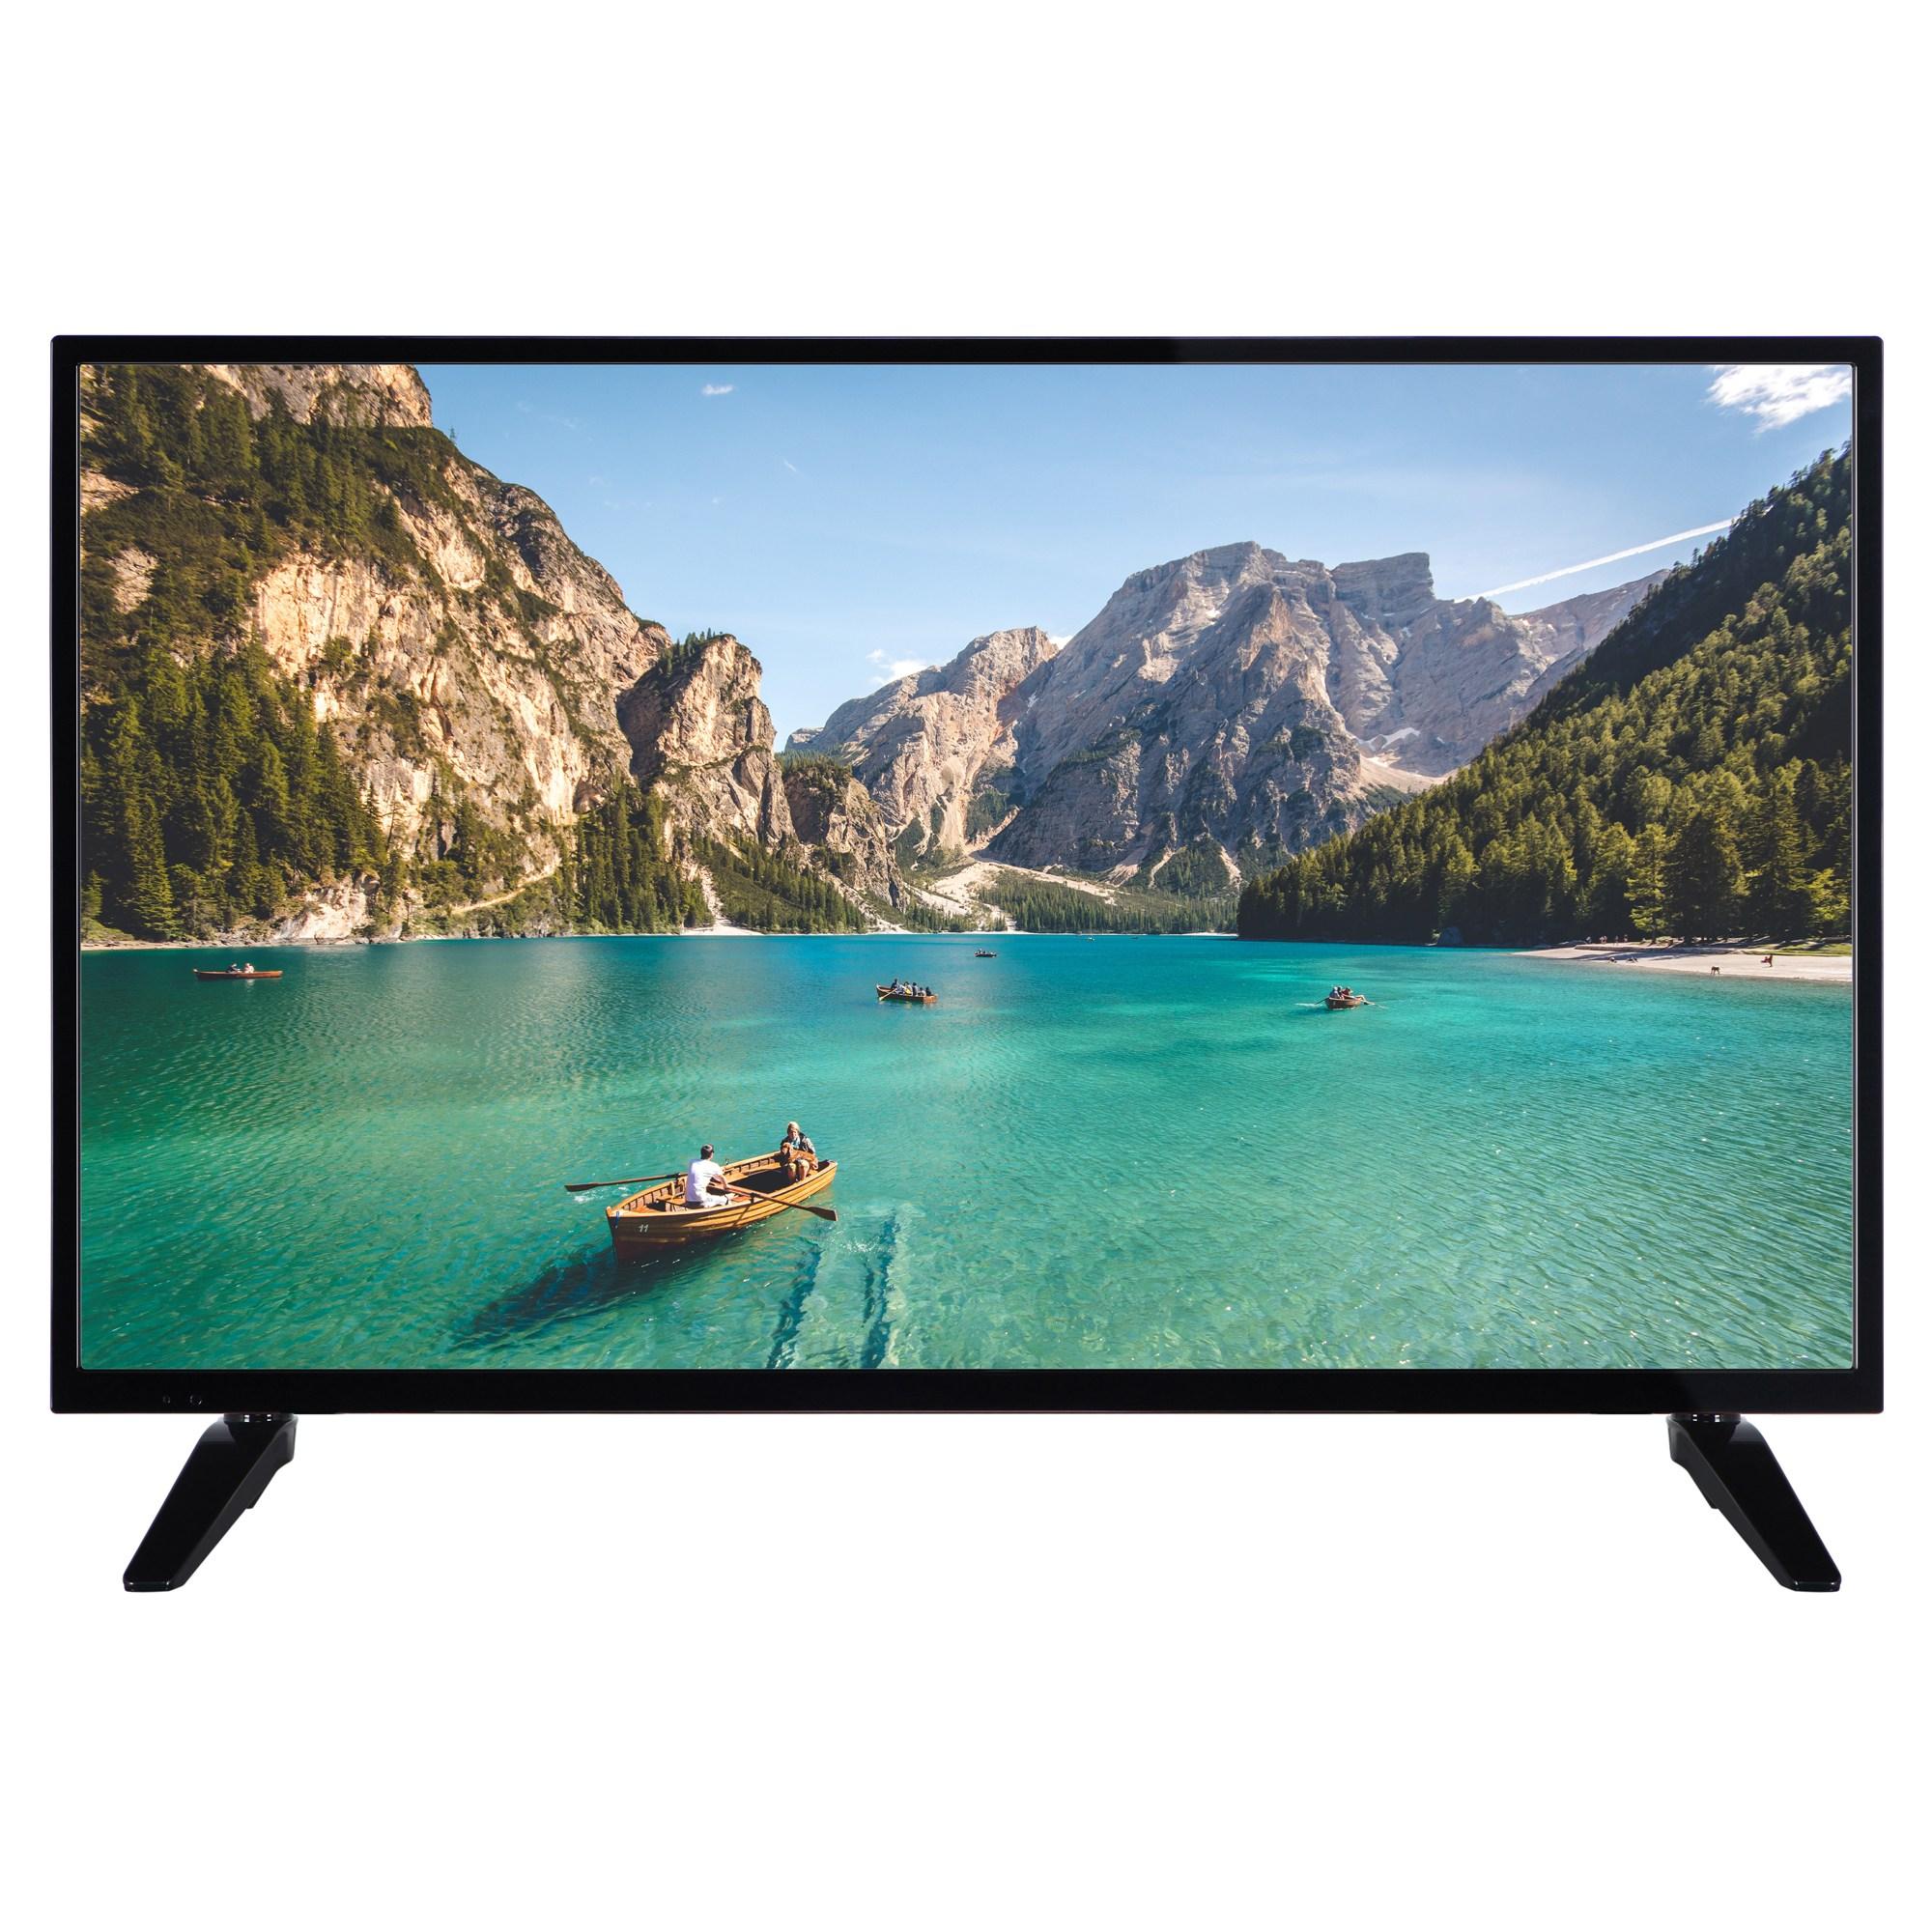 Digihome 40268UHDS 40 Ultra HD 4K LED Smart TV 2